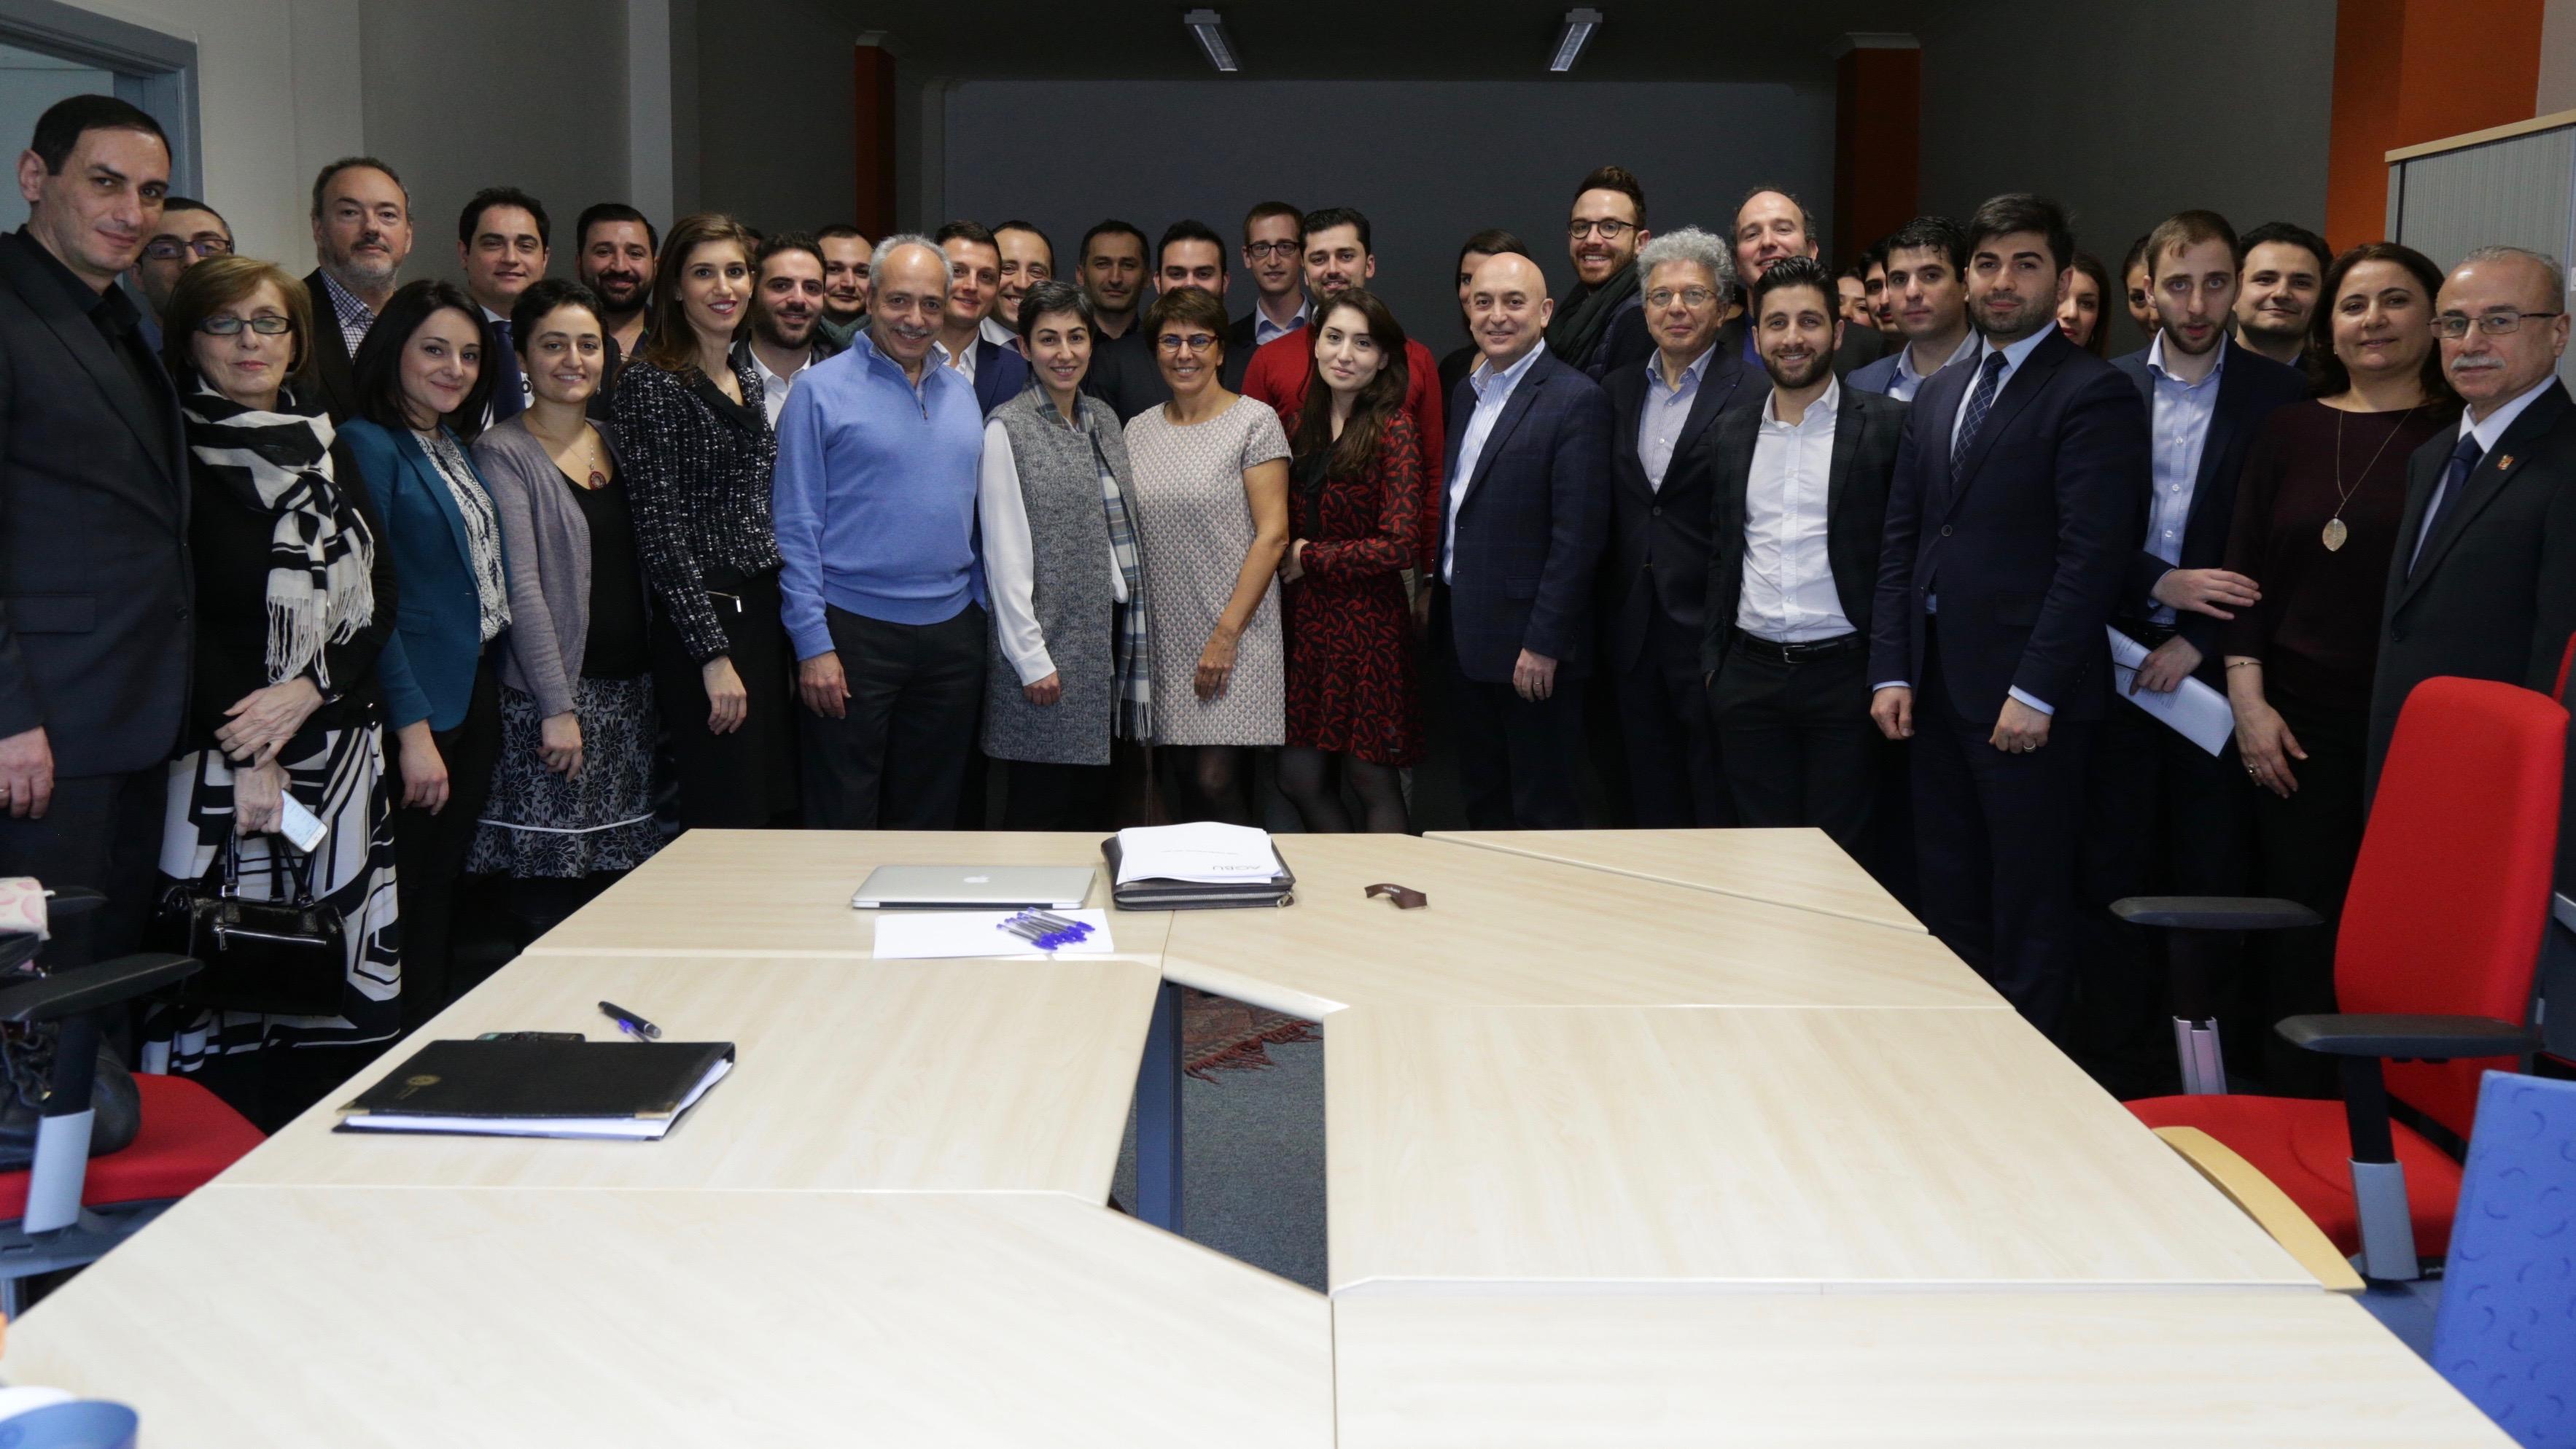 AGBU Europe Summit – Brussels, Belgium – January 28-29, 2017